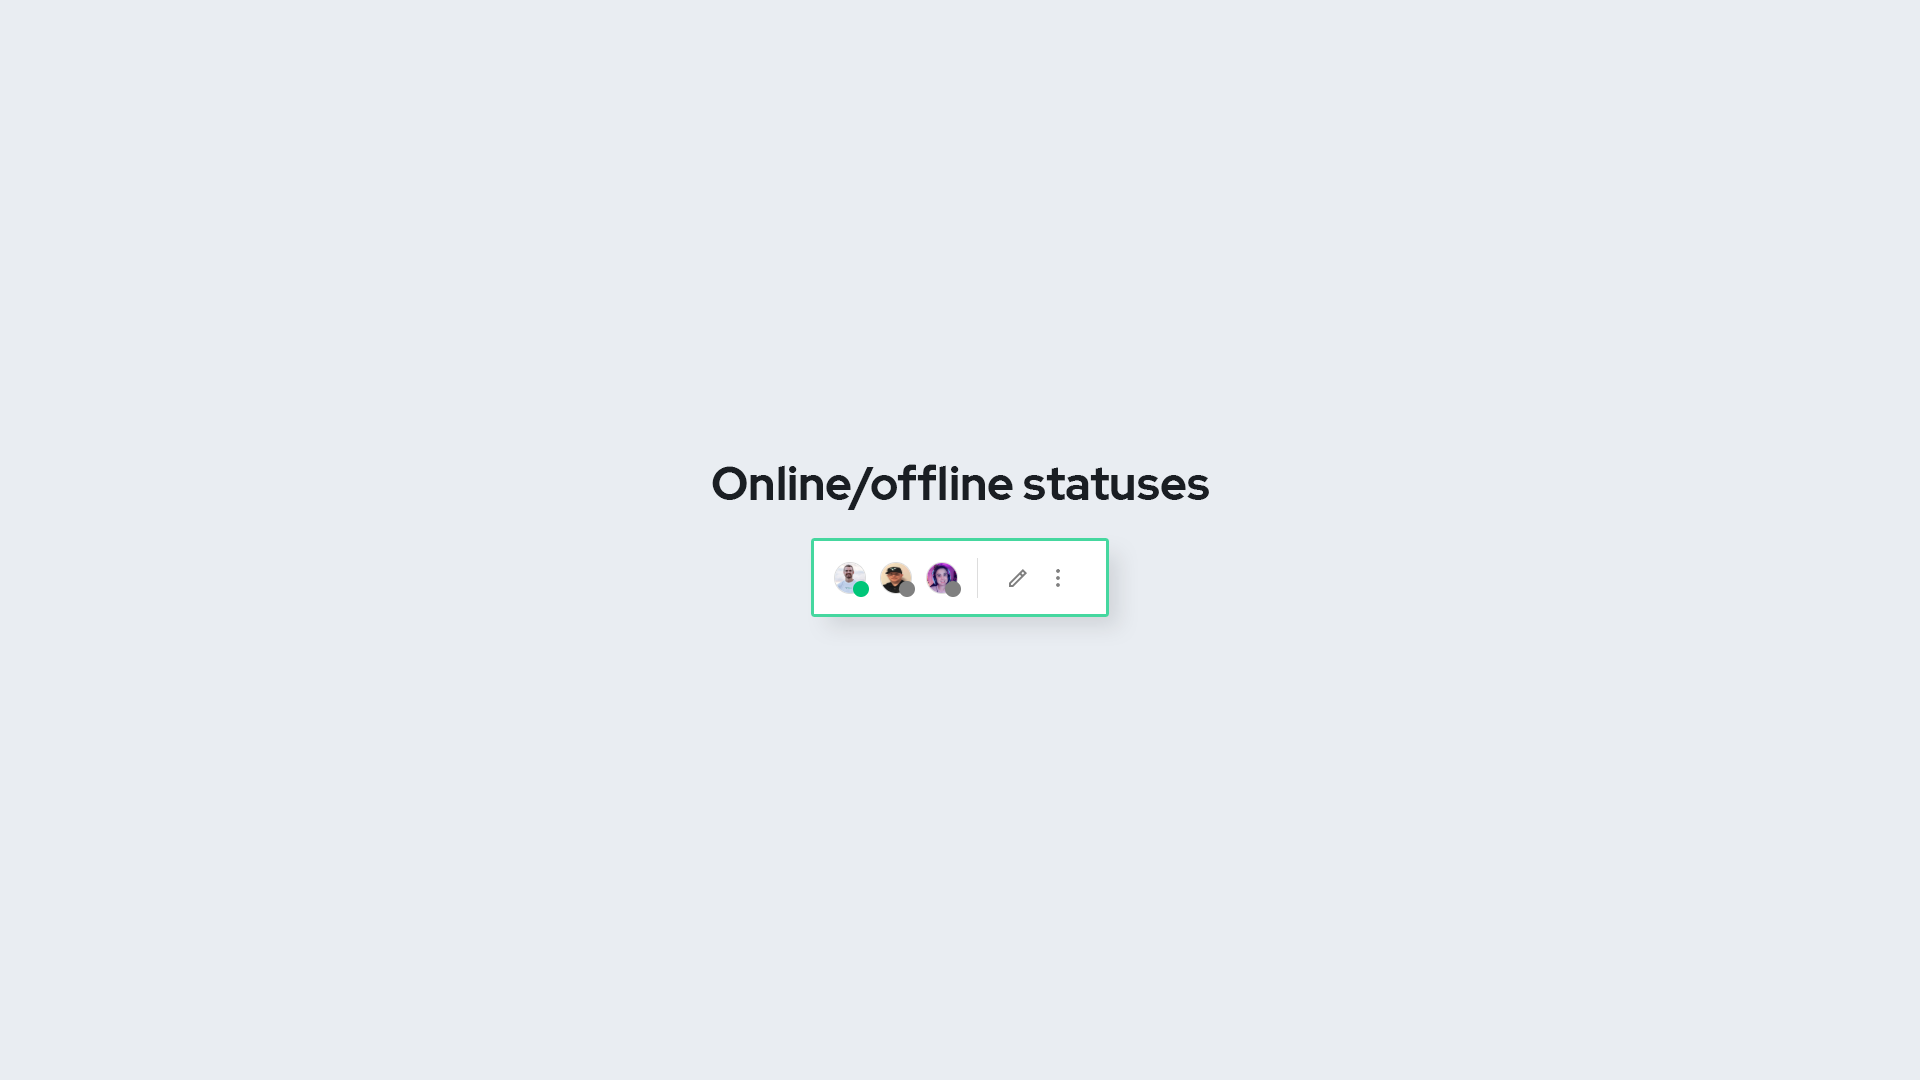 Online offline statuses